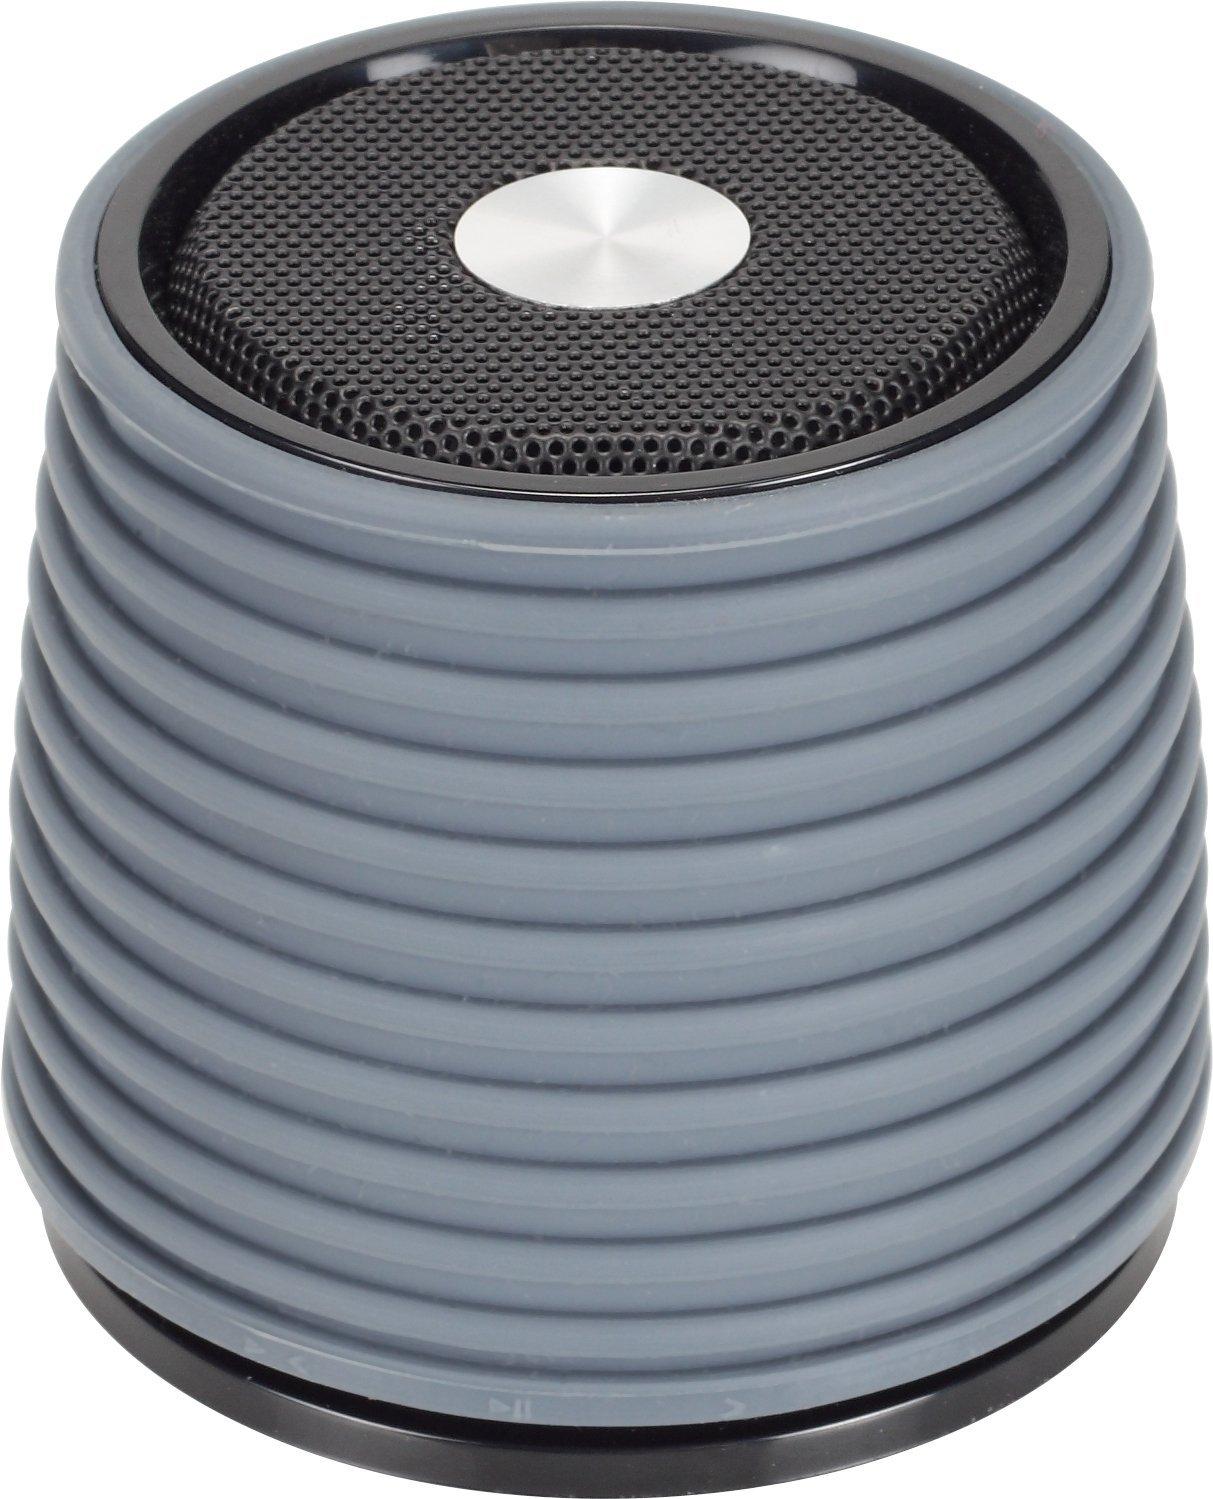 [Amazon-Prime] Audiosonic SK-1520 Bluetooth Lautsprecher Grau (AUX-IN, Bluetooth, USB) für 10,94€